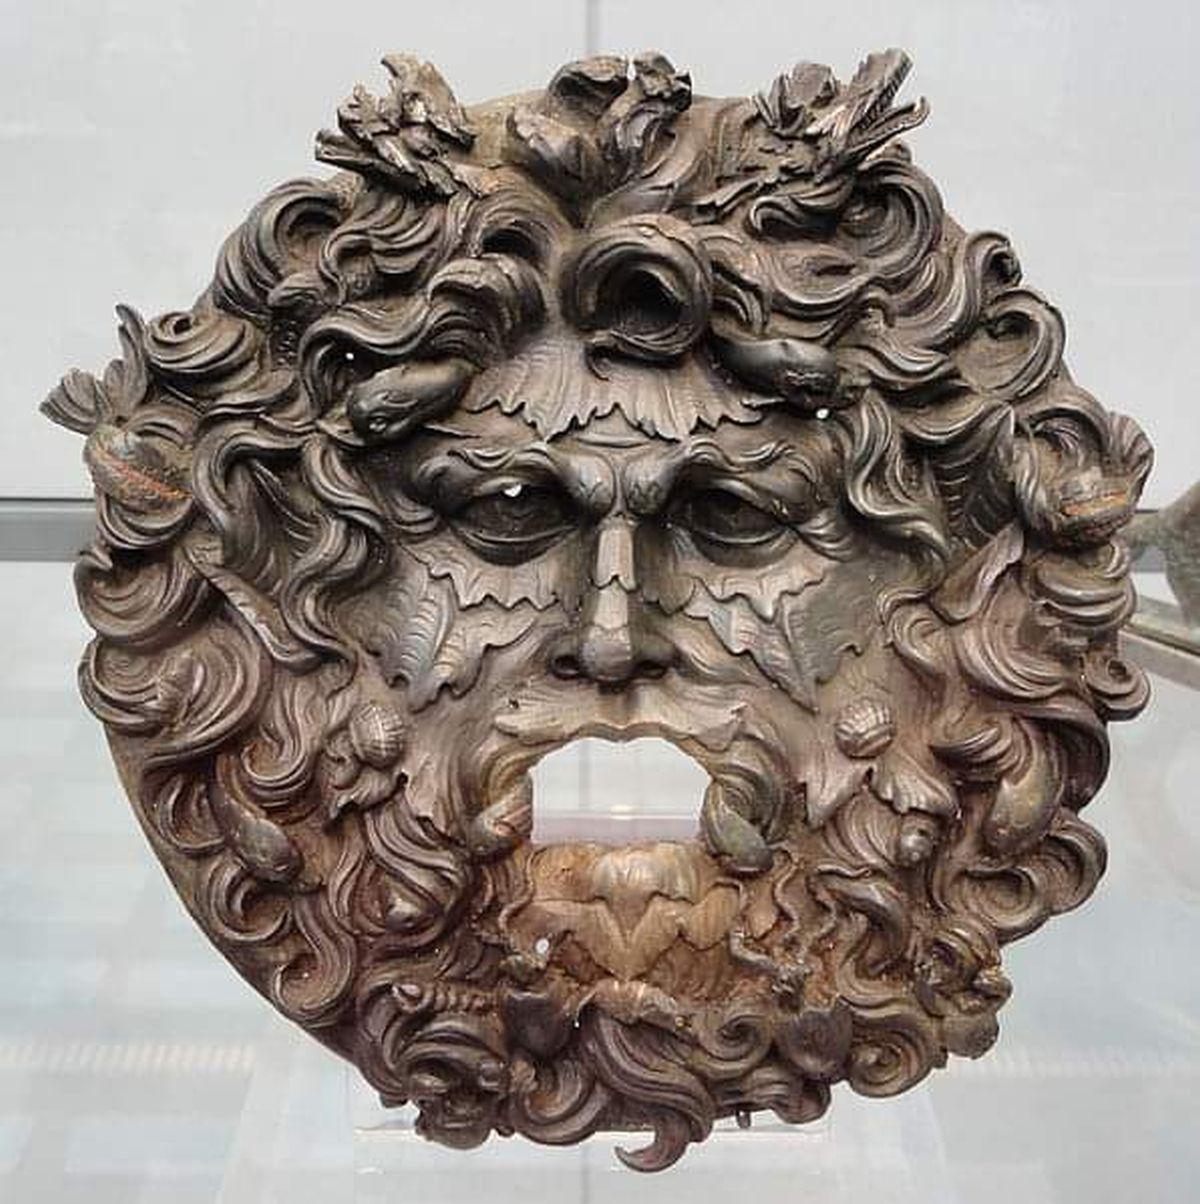 Maska rzymska ukazująca Oceanusa